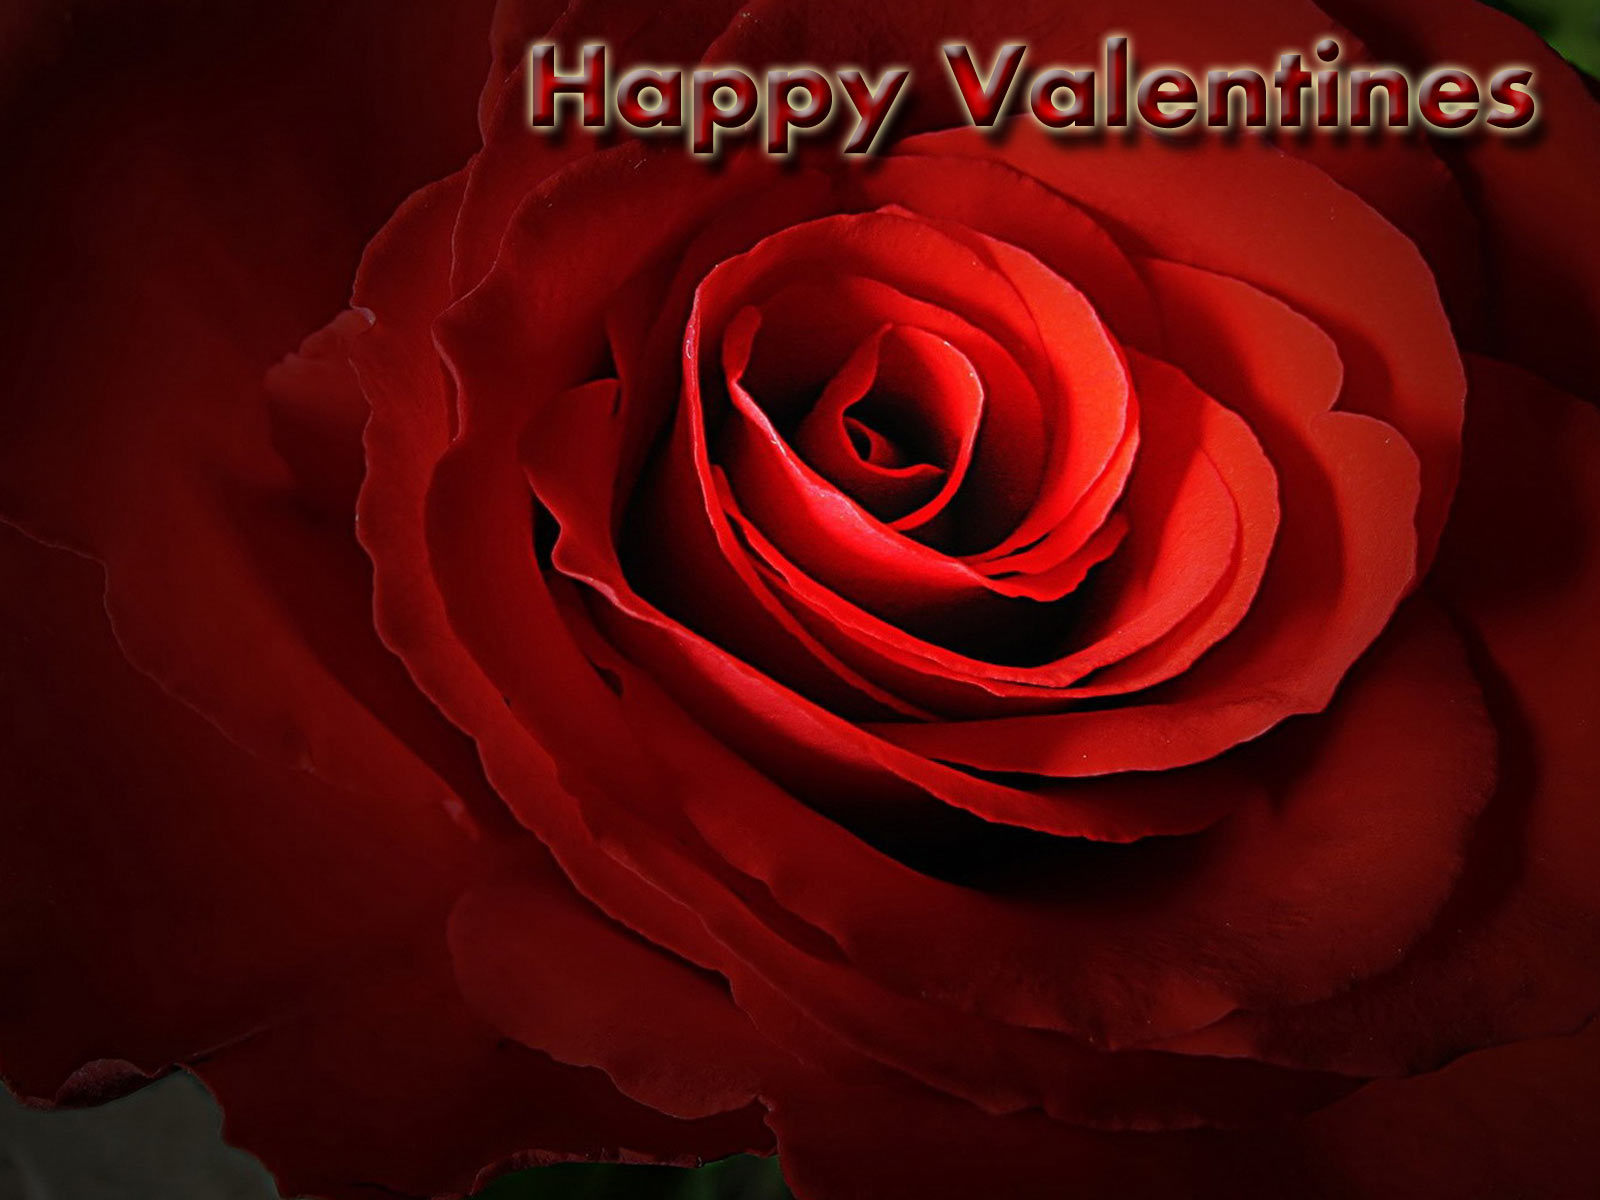 valentines day wallpaper 2012 | I - Celebes